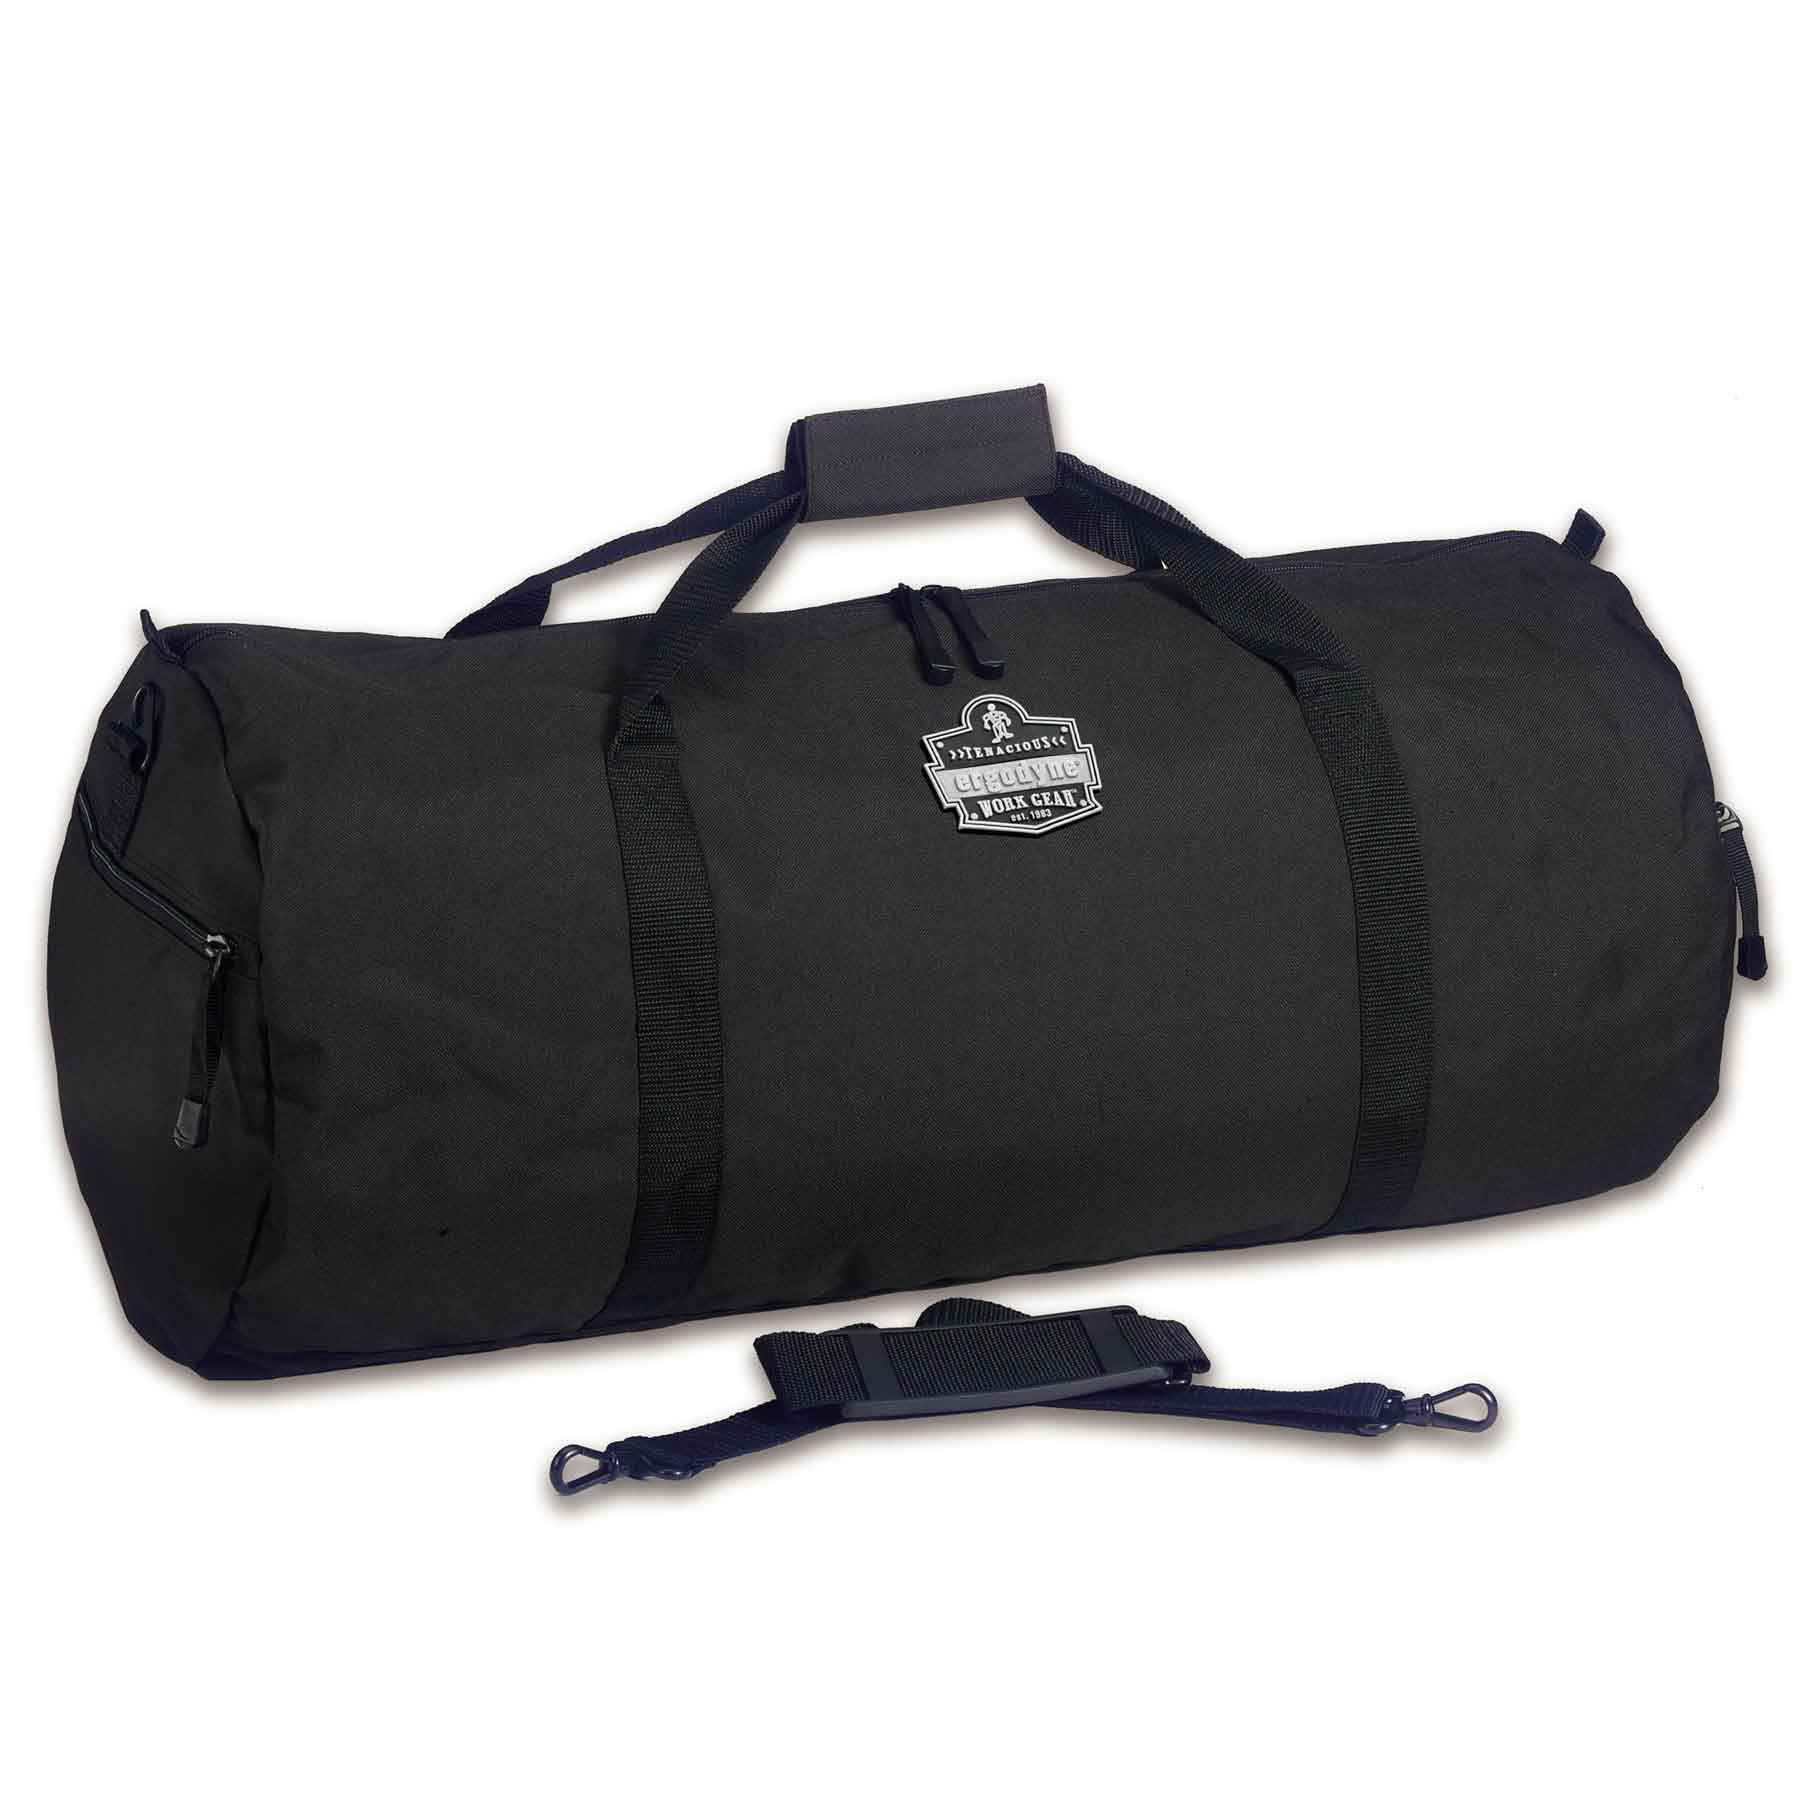 Ergodyne - GB5020P M Black Duffel Bag - Medium-Poly